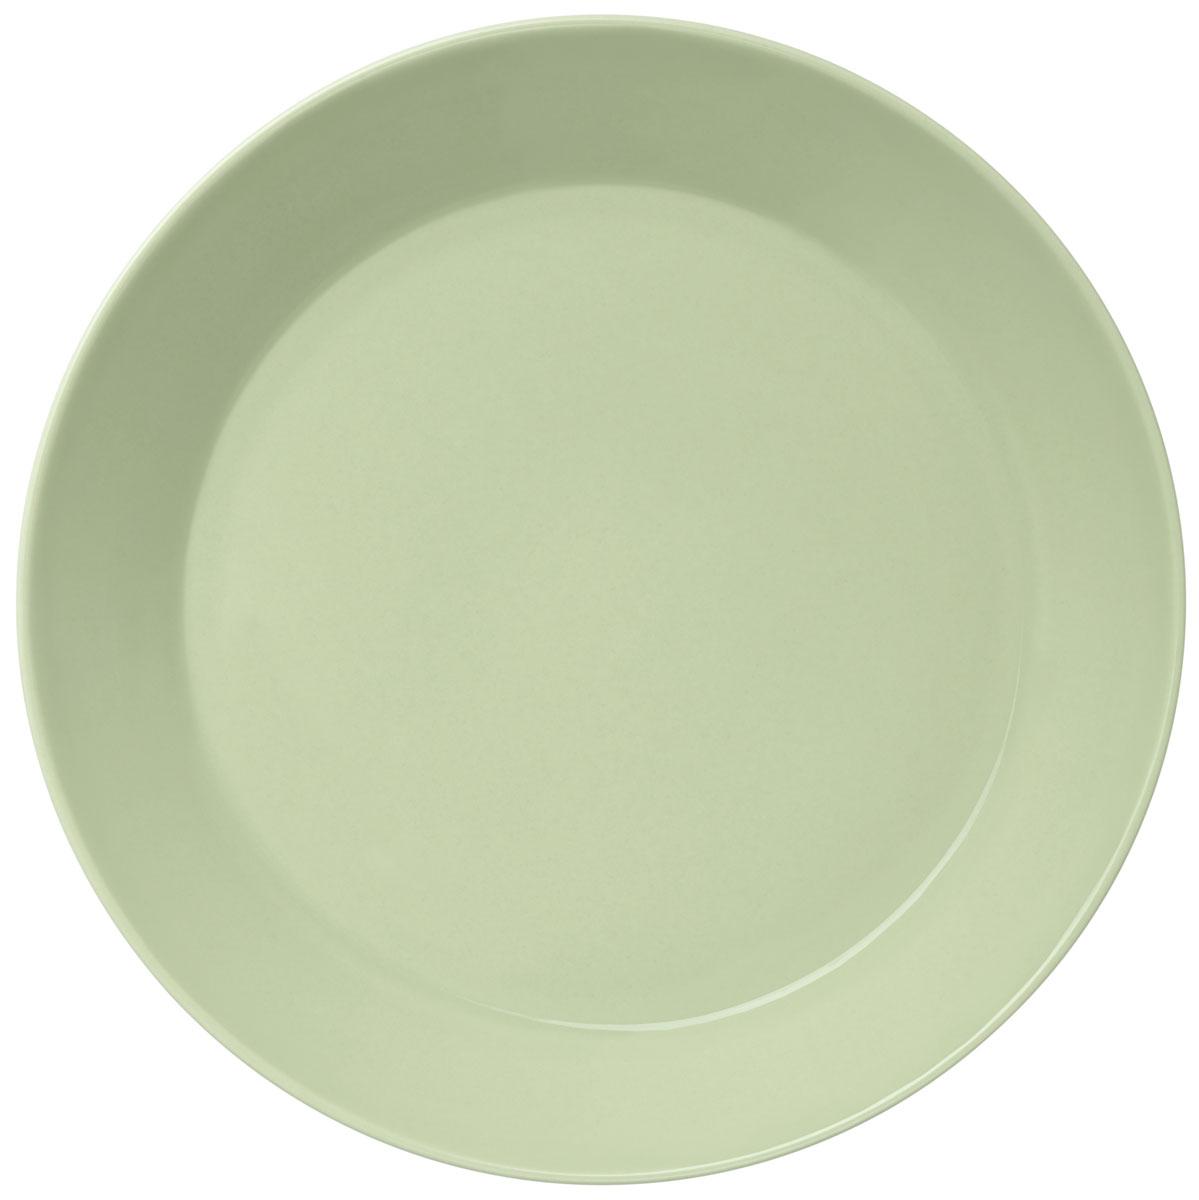 Тарелка Iittala Teema, цвет: зеленый, диаметр 21 см1005970